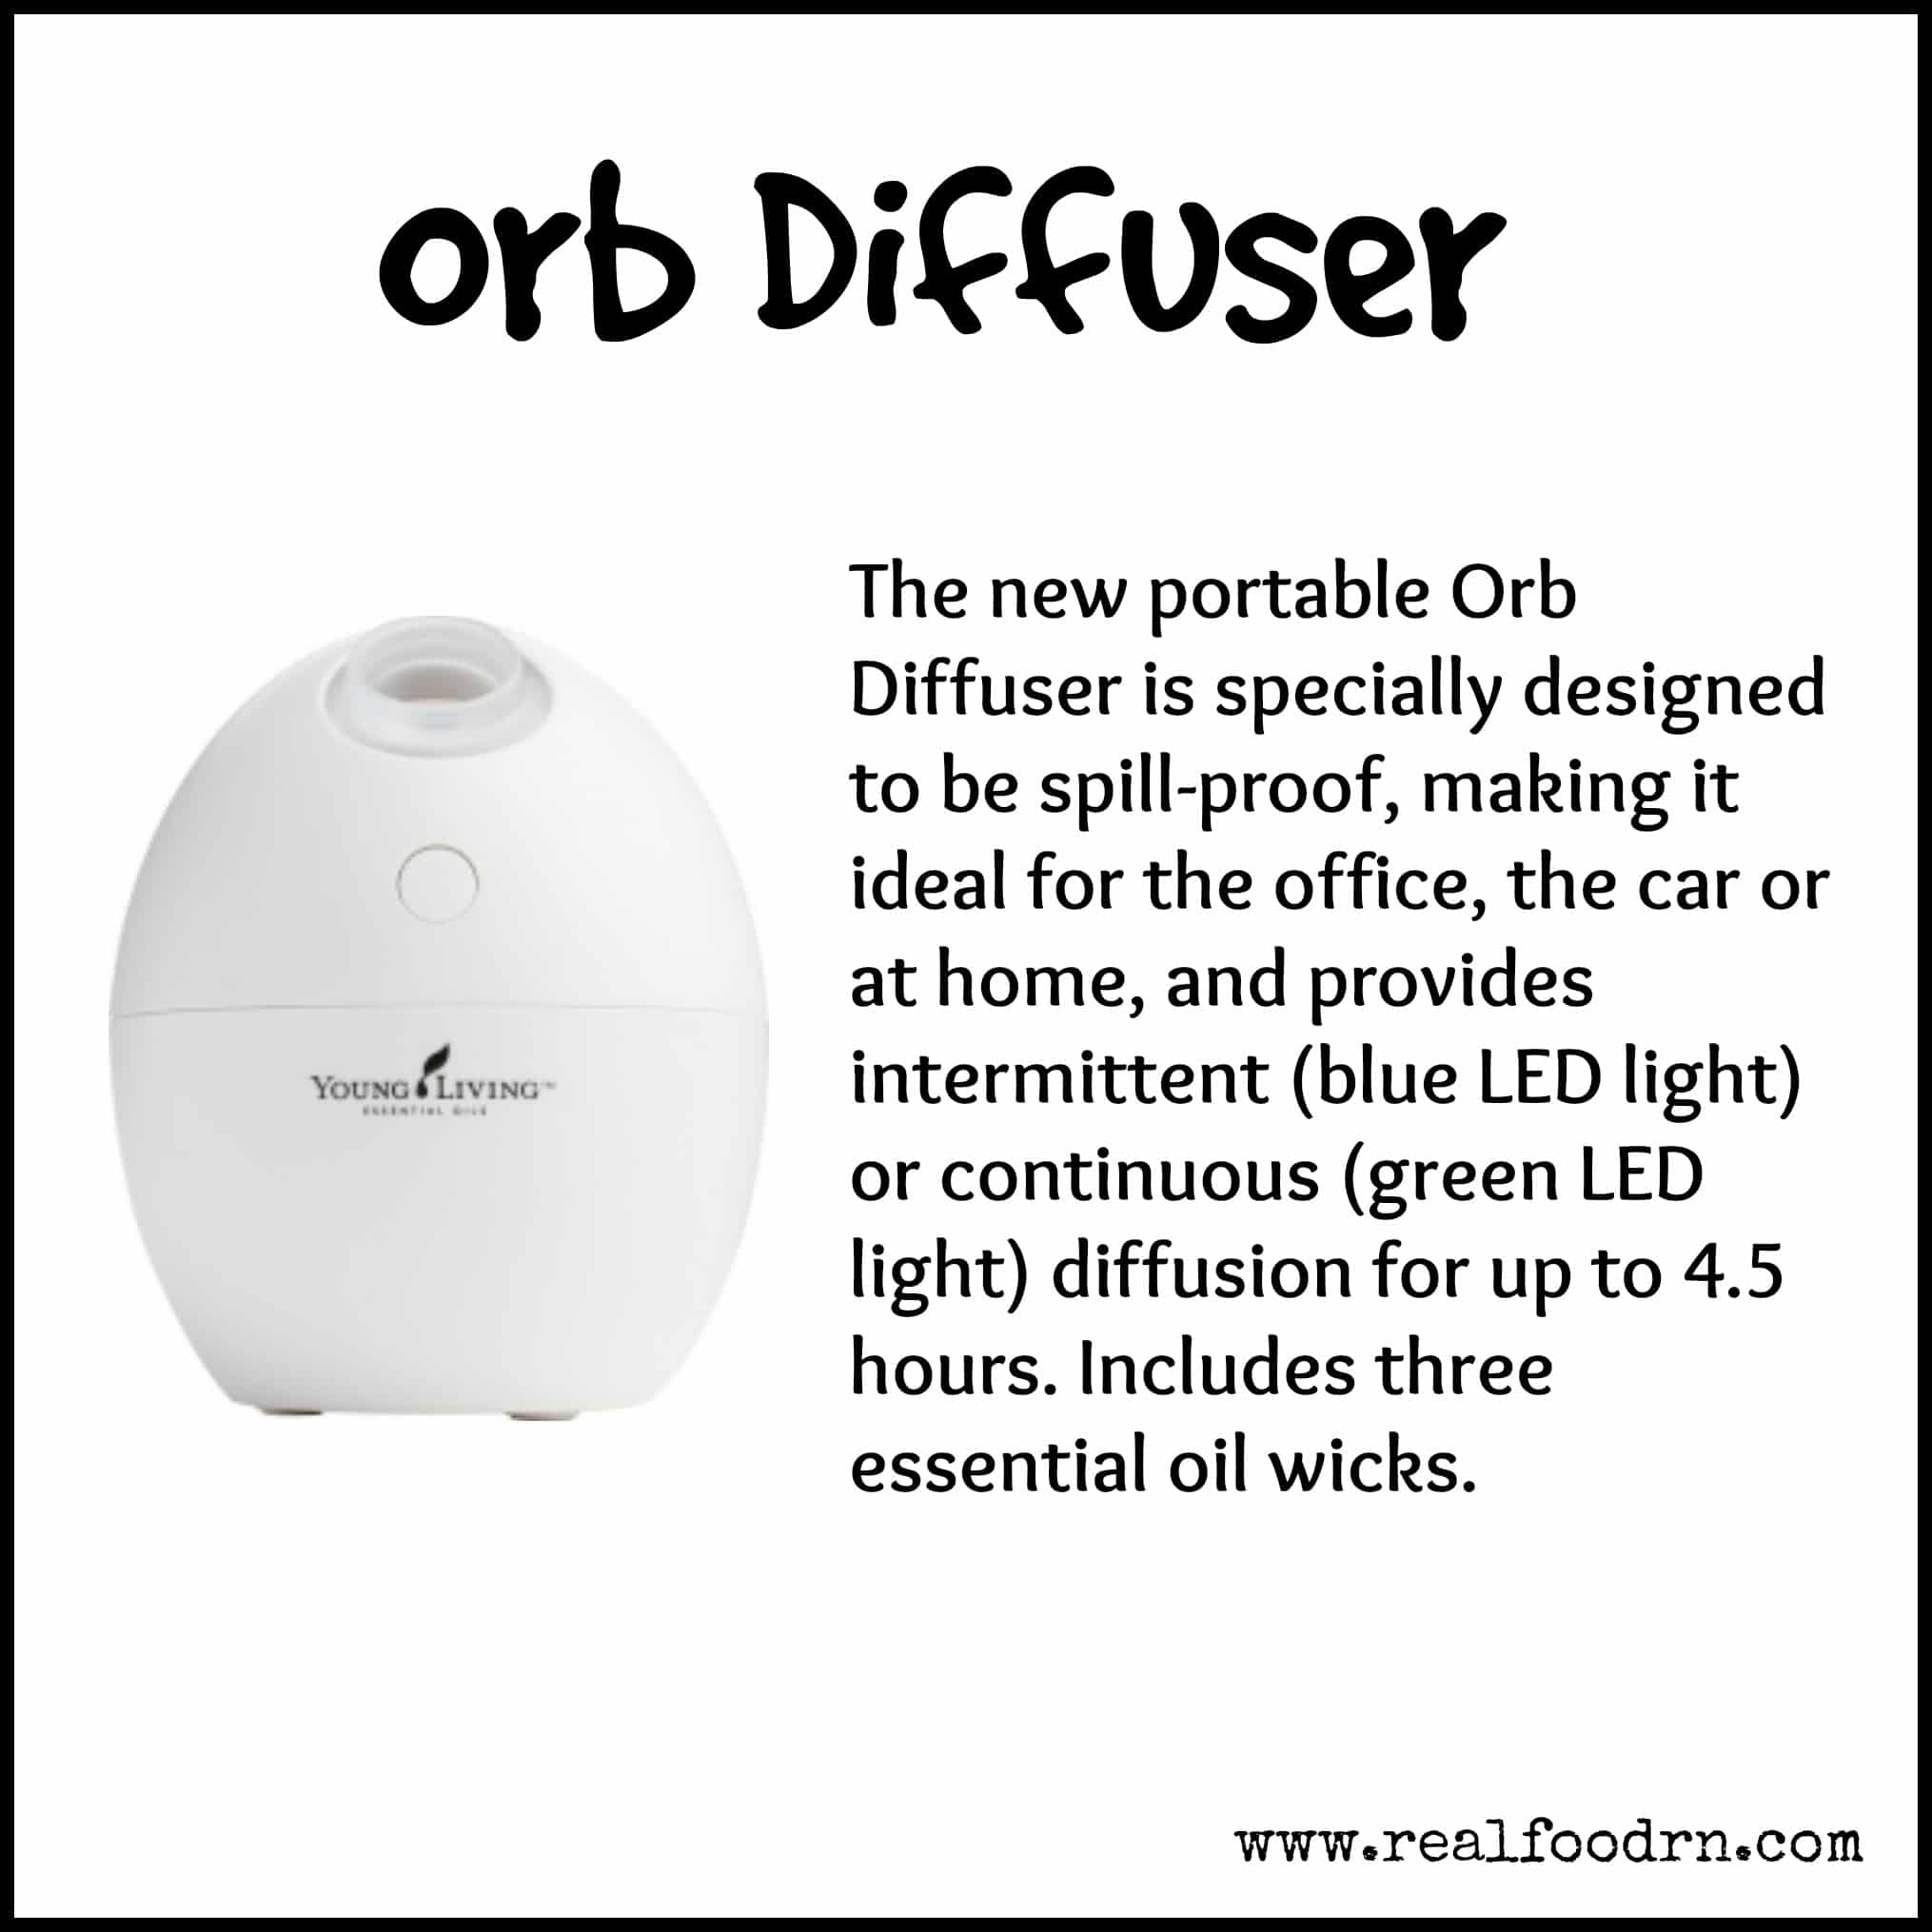 Orb Diffuser